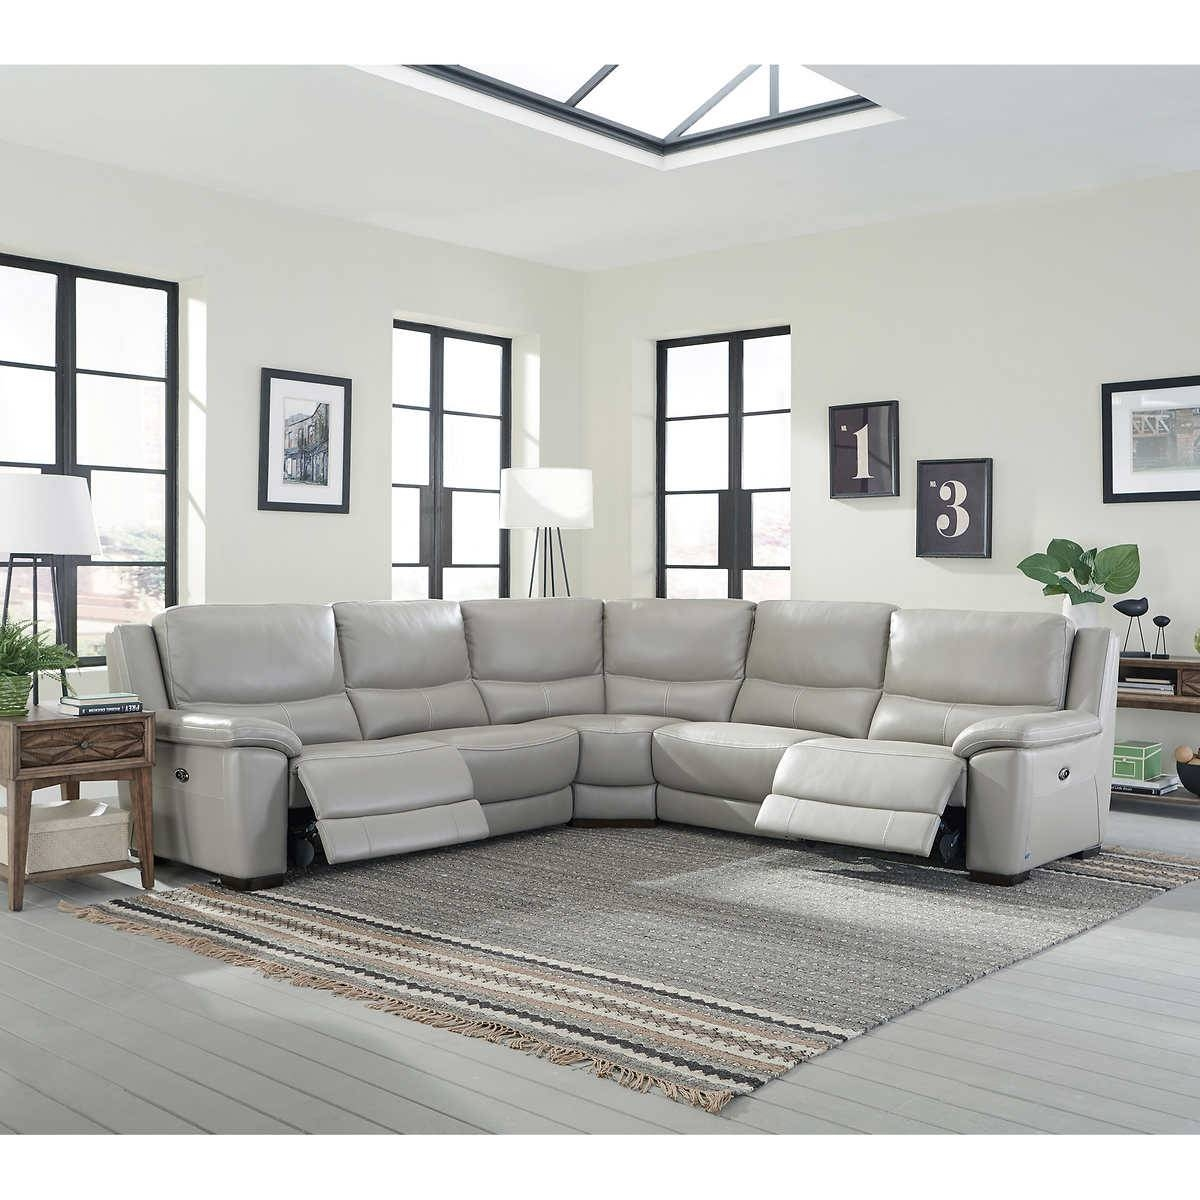 Sofas Center : Costco Power Reclining Sofa Recliner Berkline Sofas throughout Berkline Sofa Recliner (Image 21 of 30)